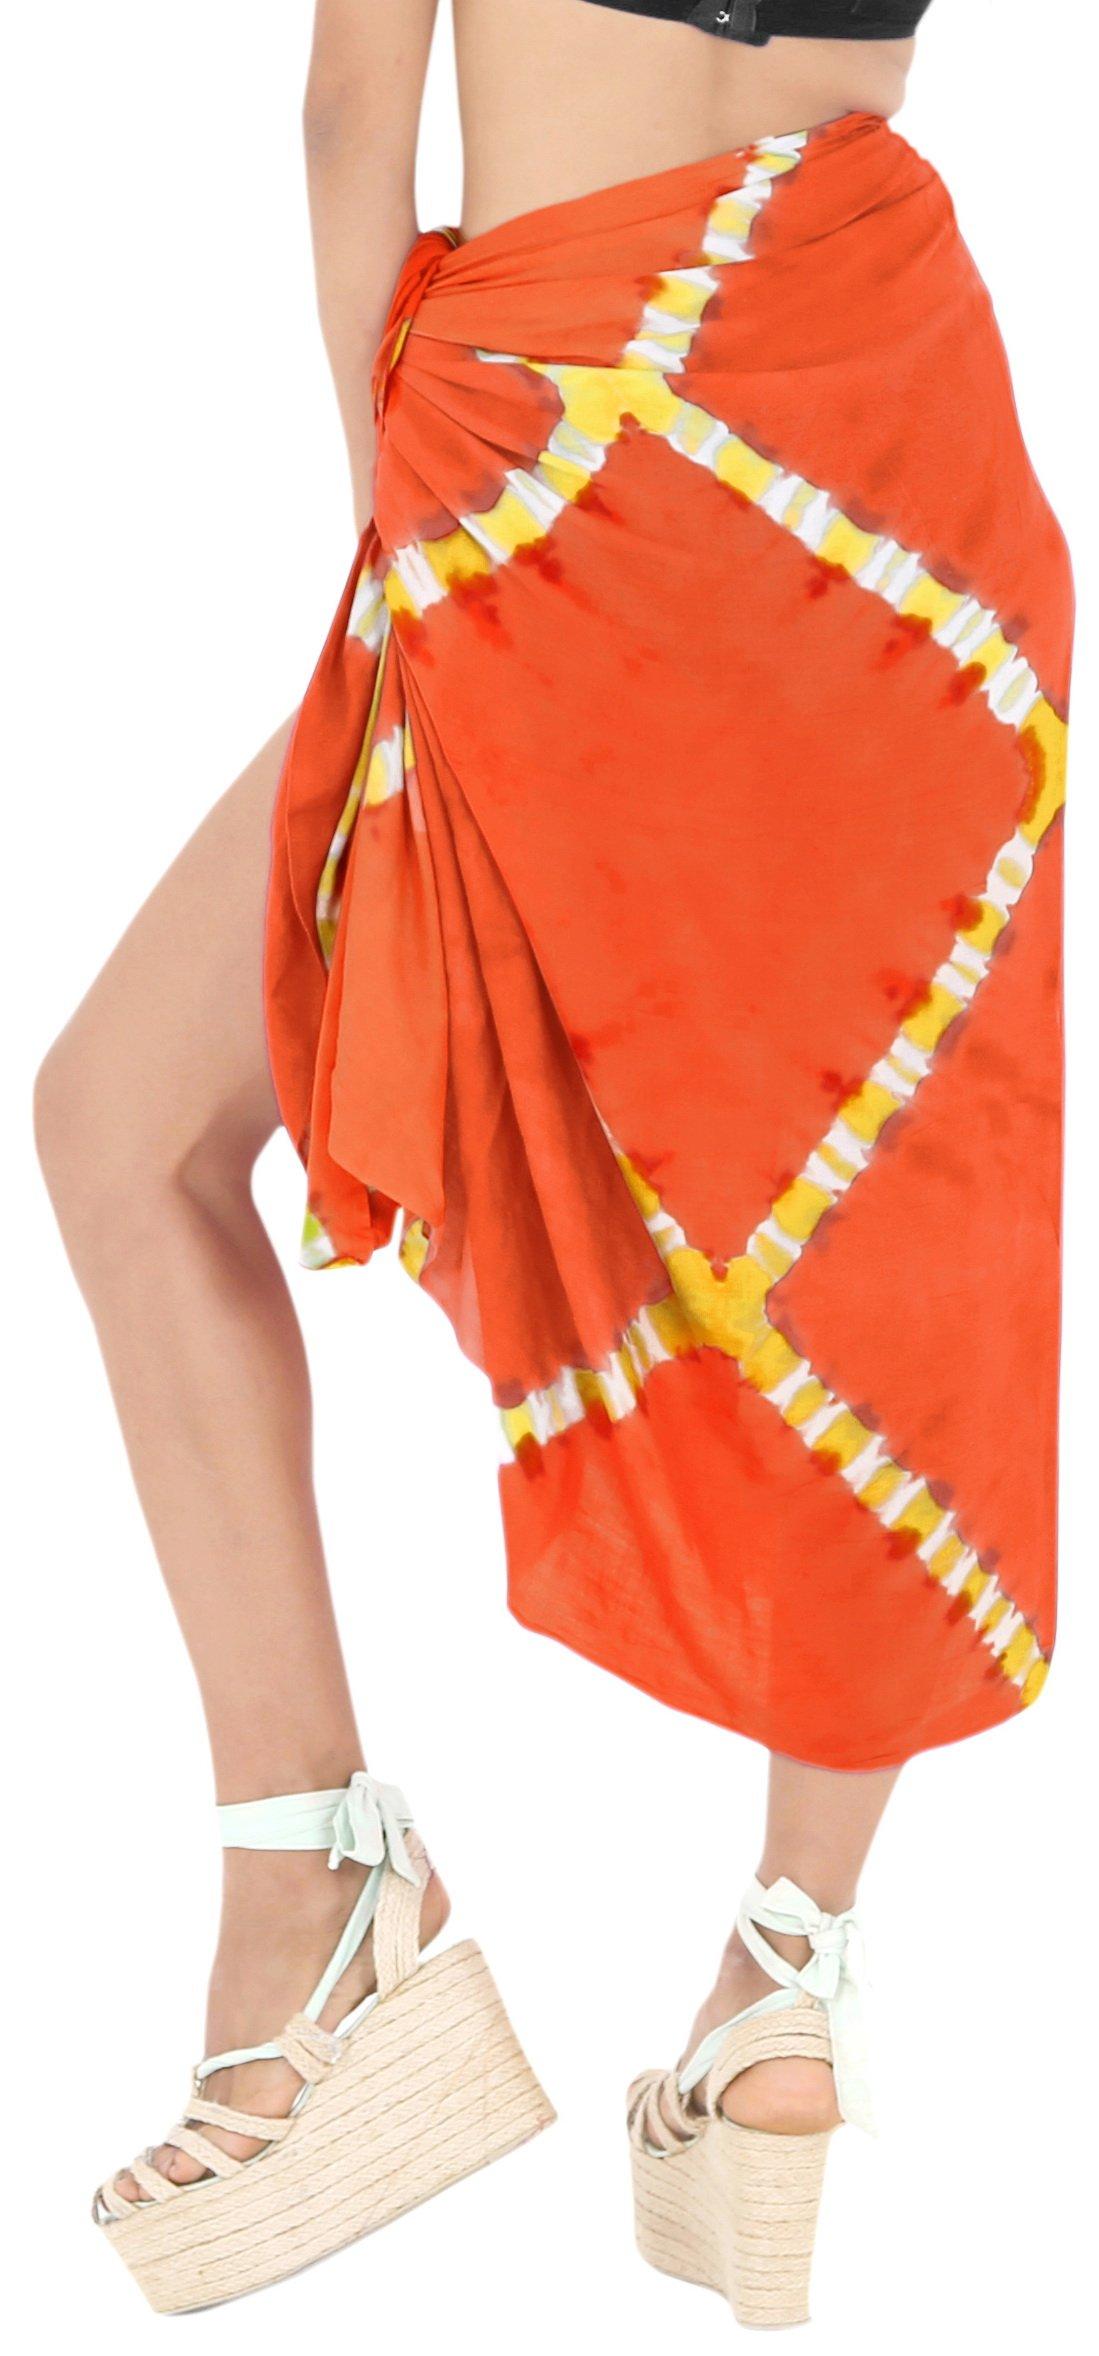 LA LEELA Rayon Costumi da Bagno Involucro Pareo Avvolgere Lungo Sarong Tie Dye 4 spesavip